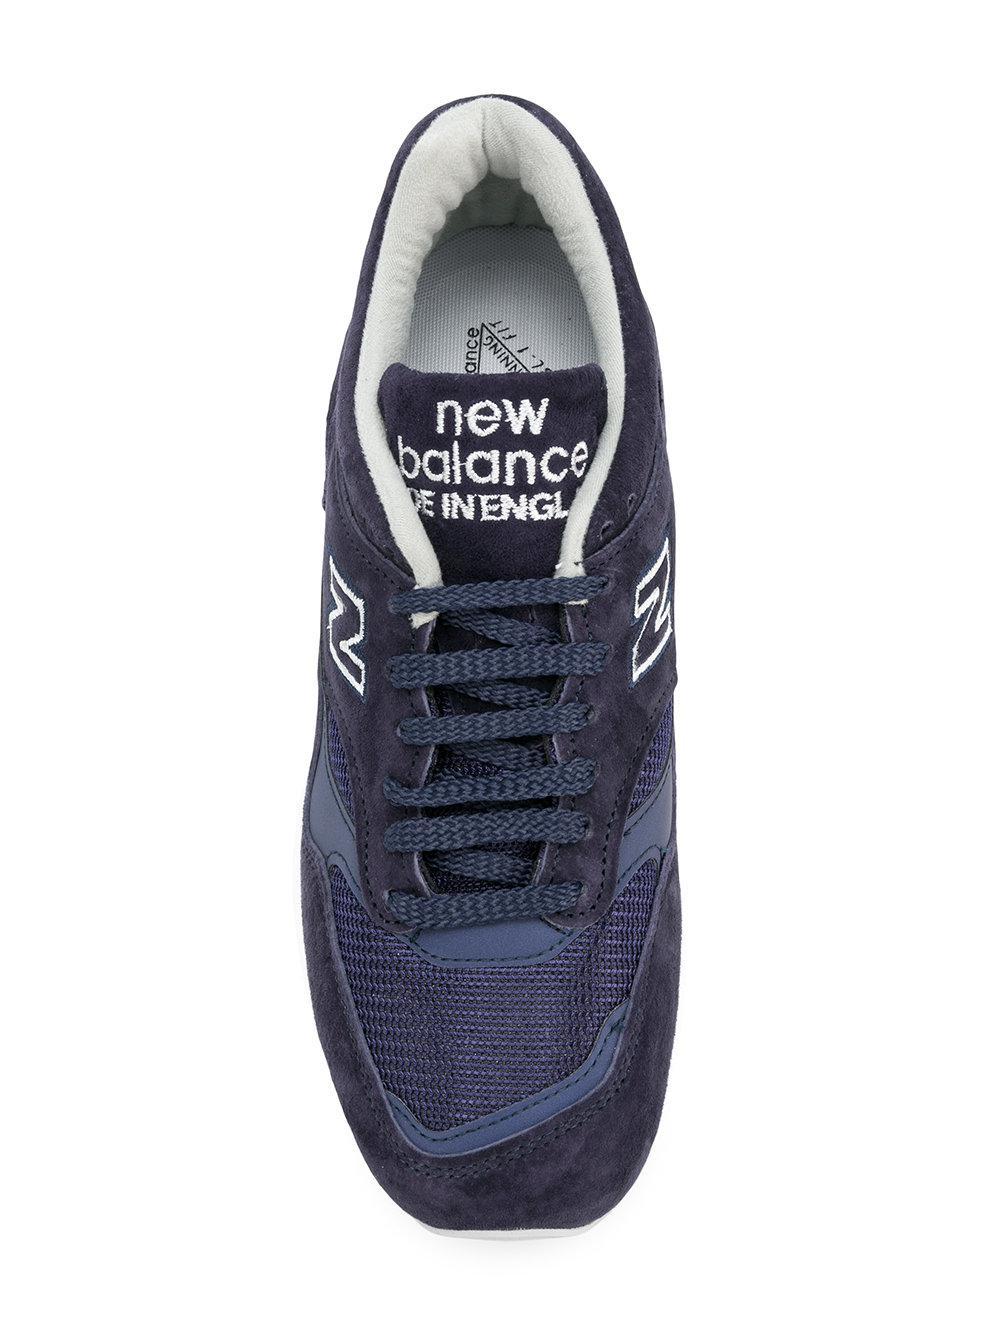 New Balance Leather M 1500 Jda Sneakers